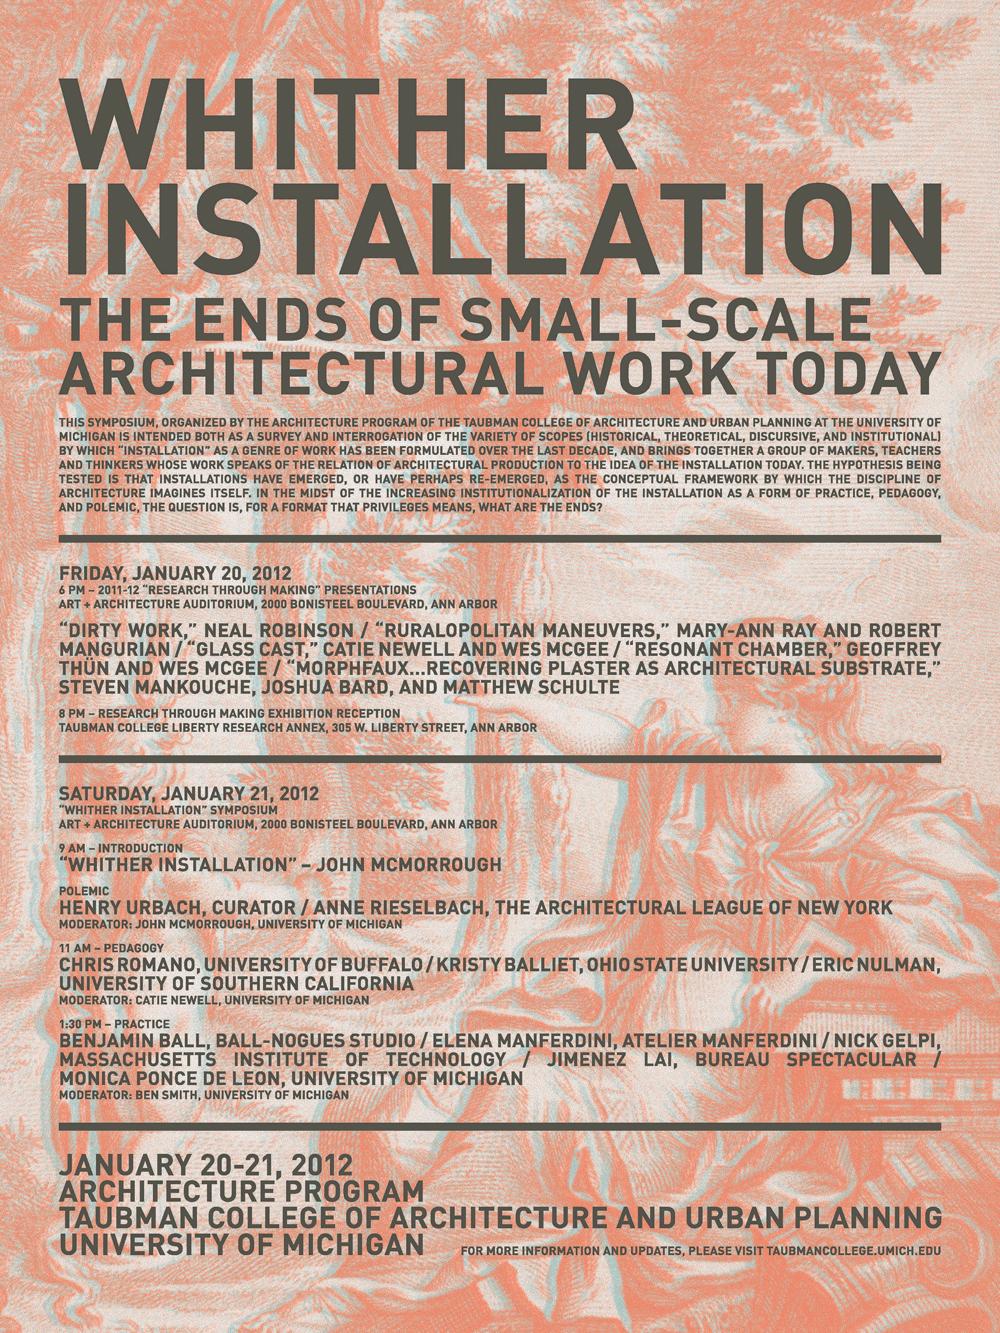 Whither Symposium flyer